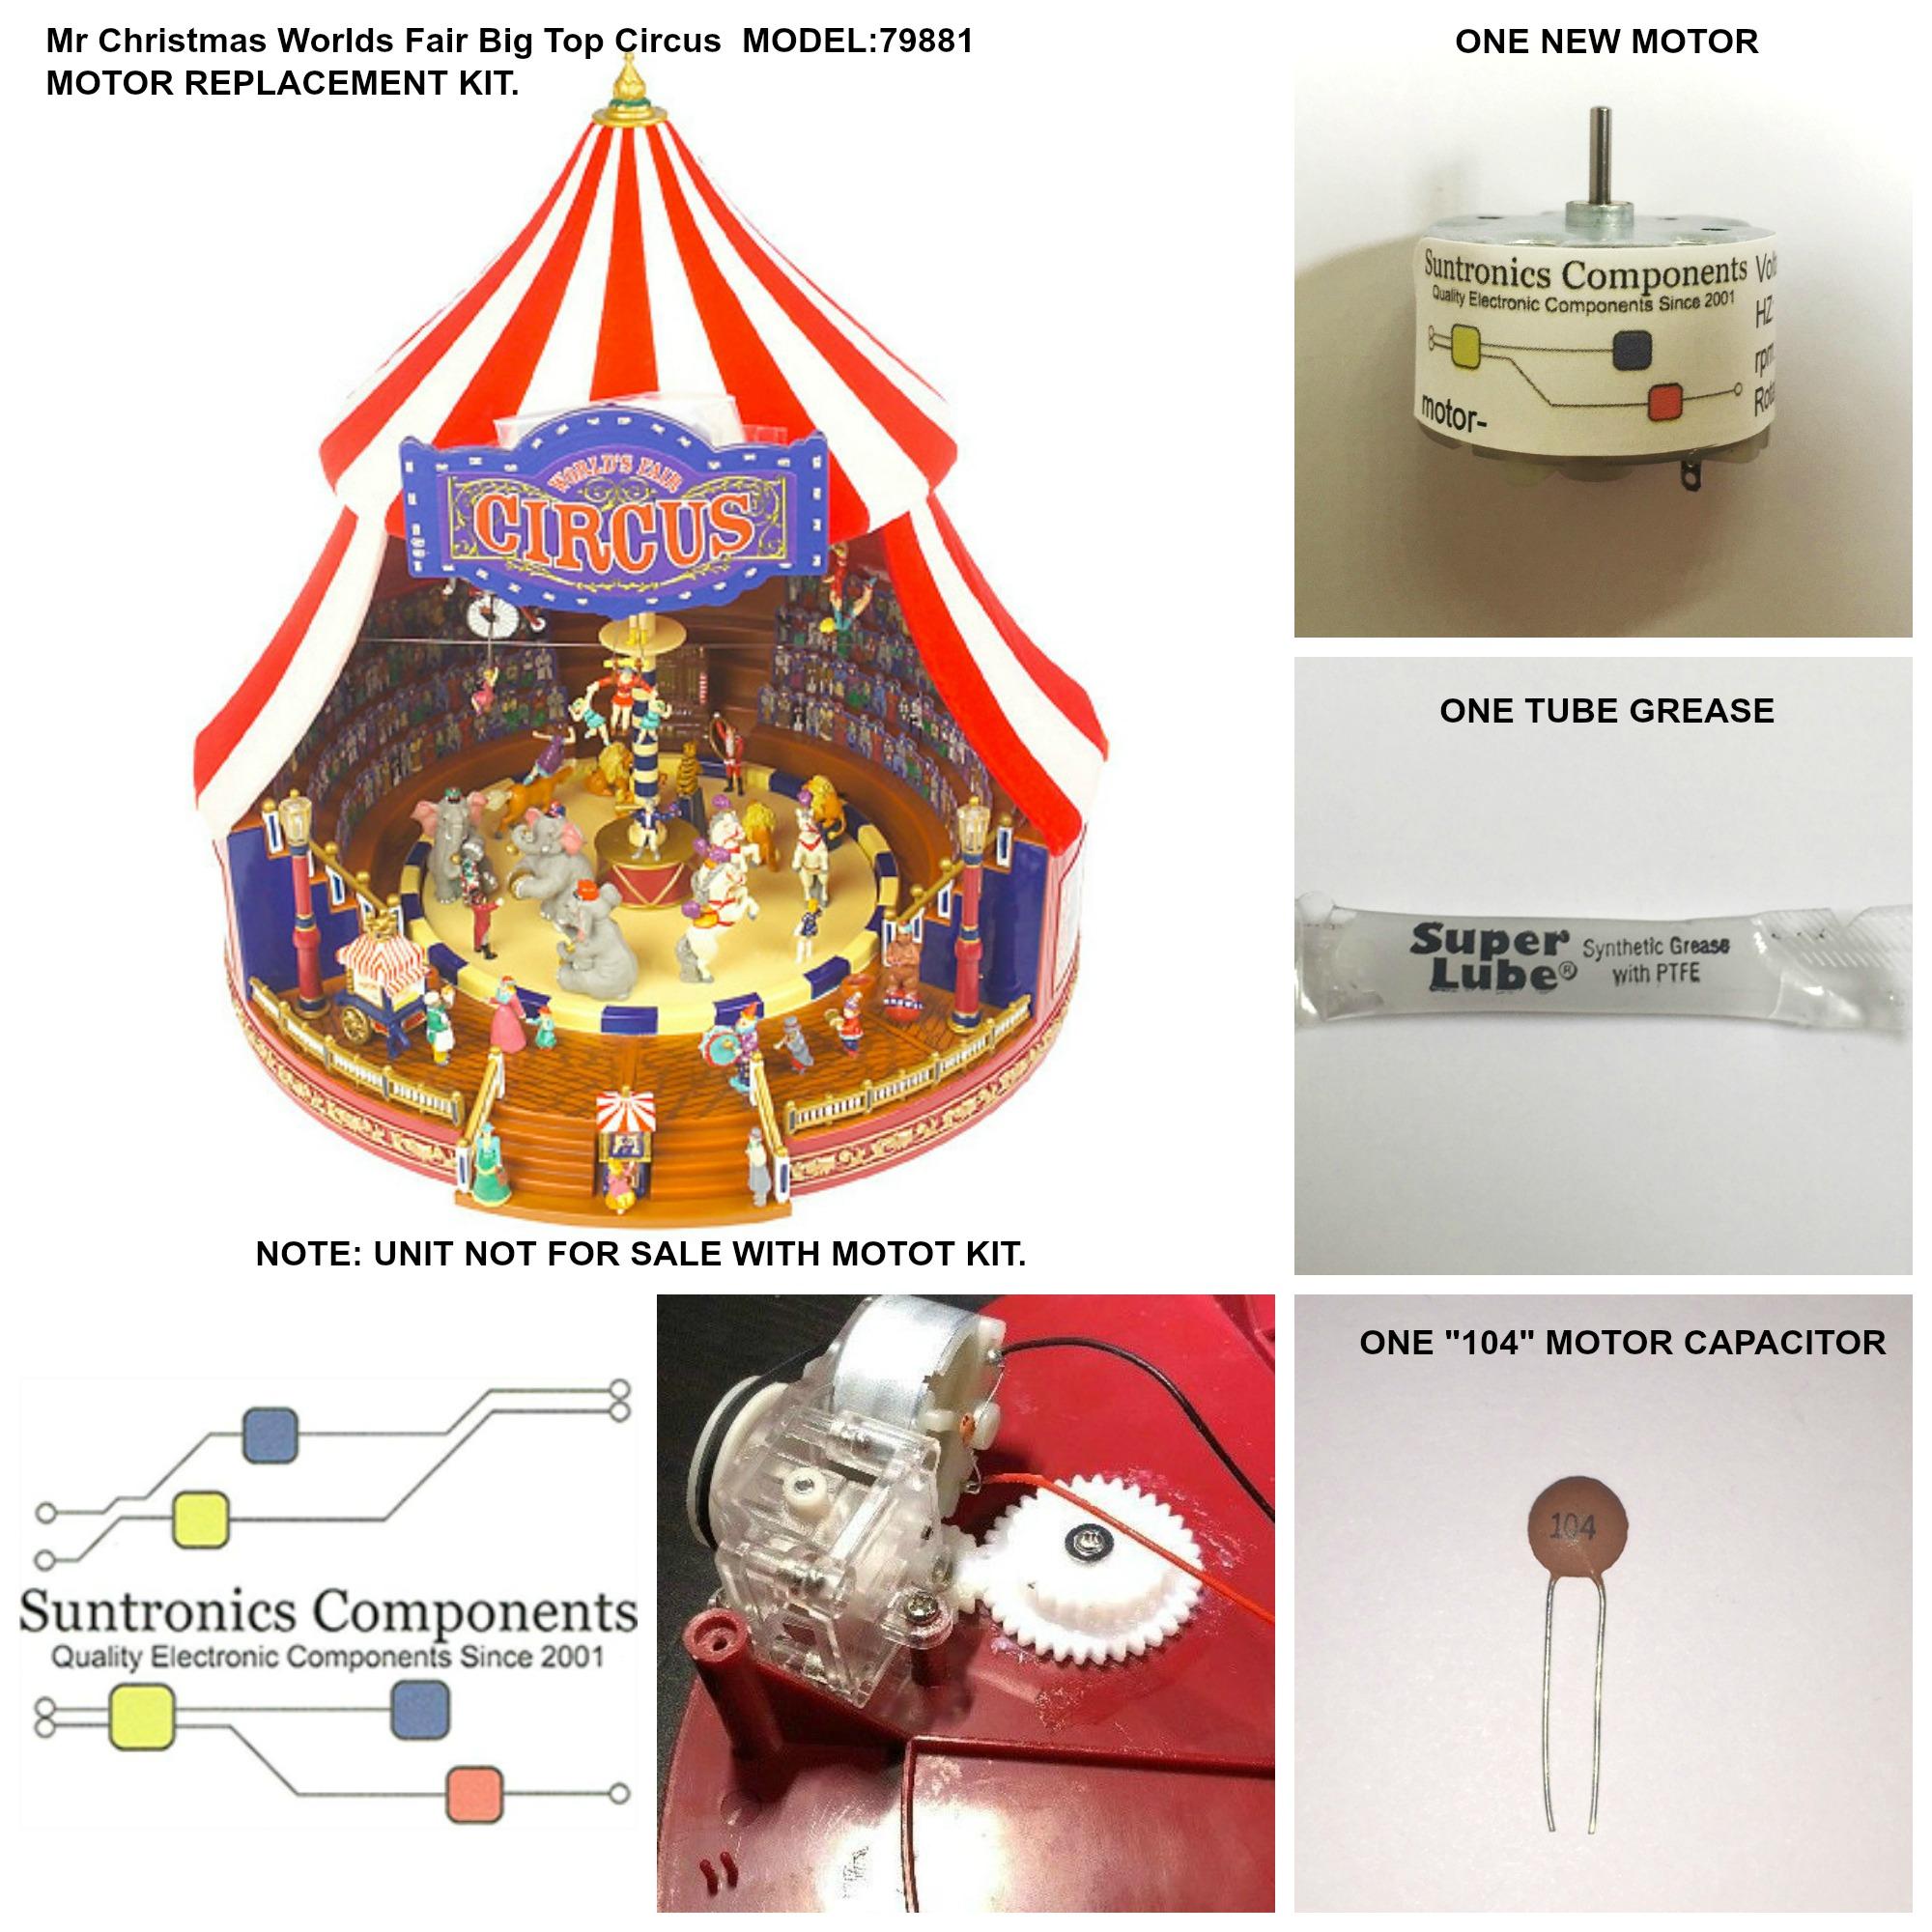 PicMonkey Image Mr Christmas Worlds Fair